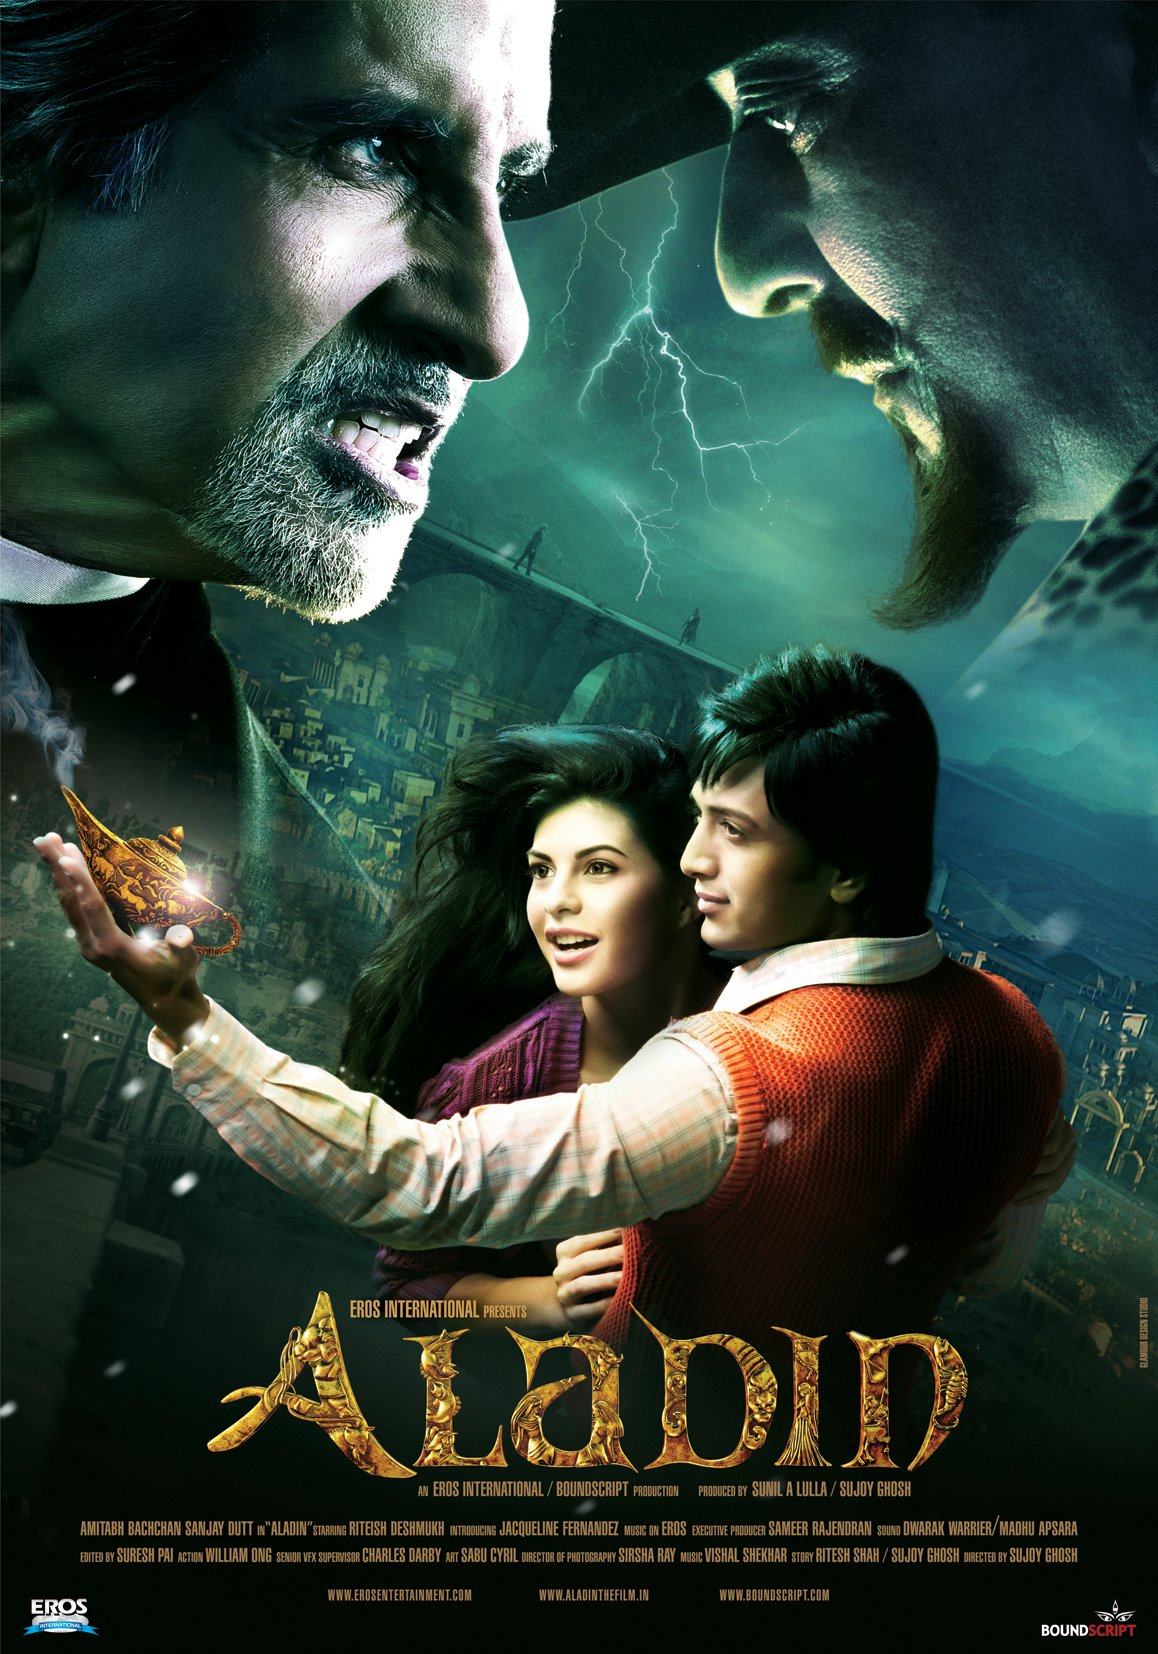 Aladin English Subtitled Amitabh Bachchan Sanjay Story Books Of Dutt Riteish Deshmukh Jacqueline Fernandez Amazon Digital Services Llc